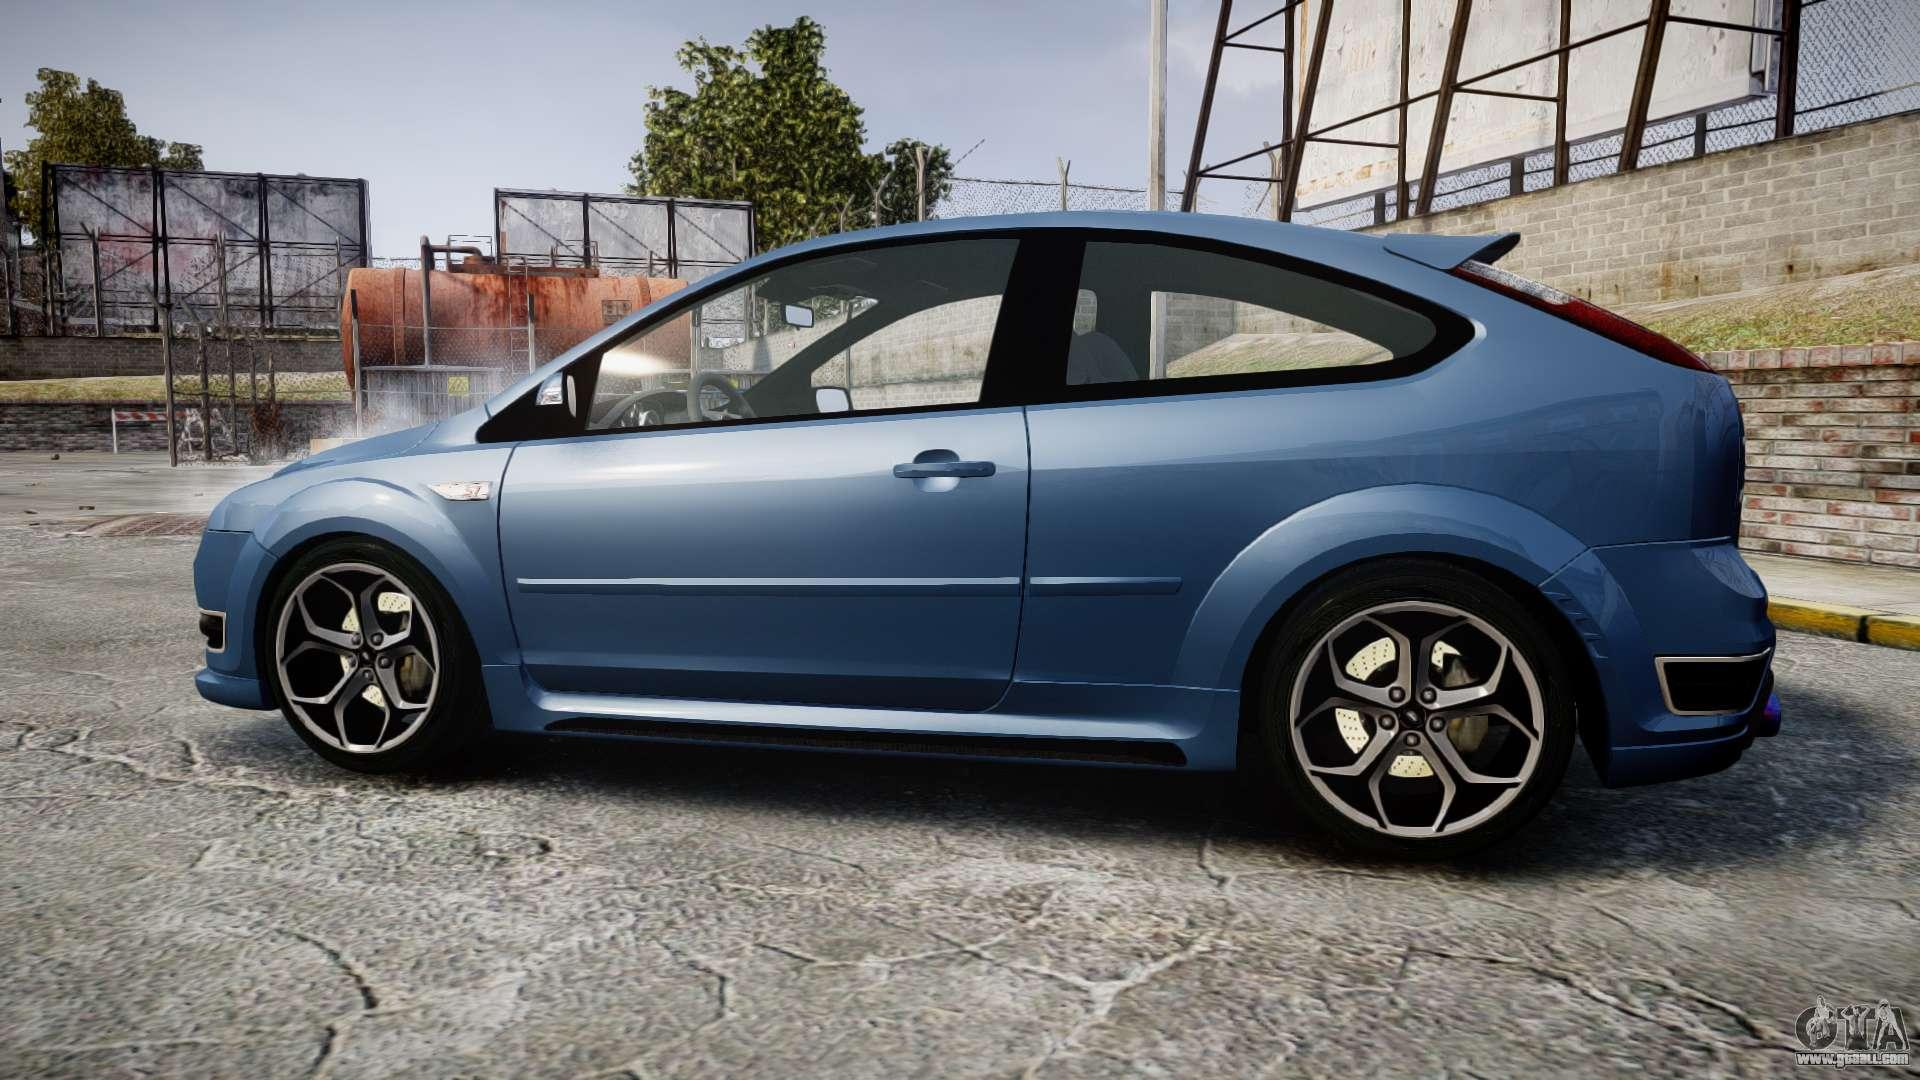 Gta  Car Mods Ford Focus